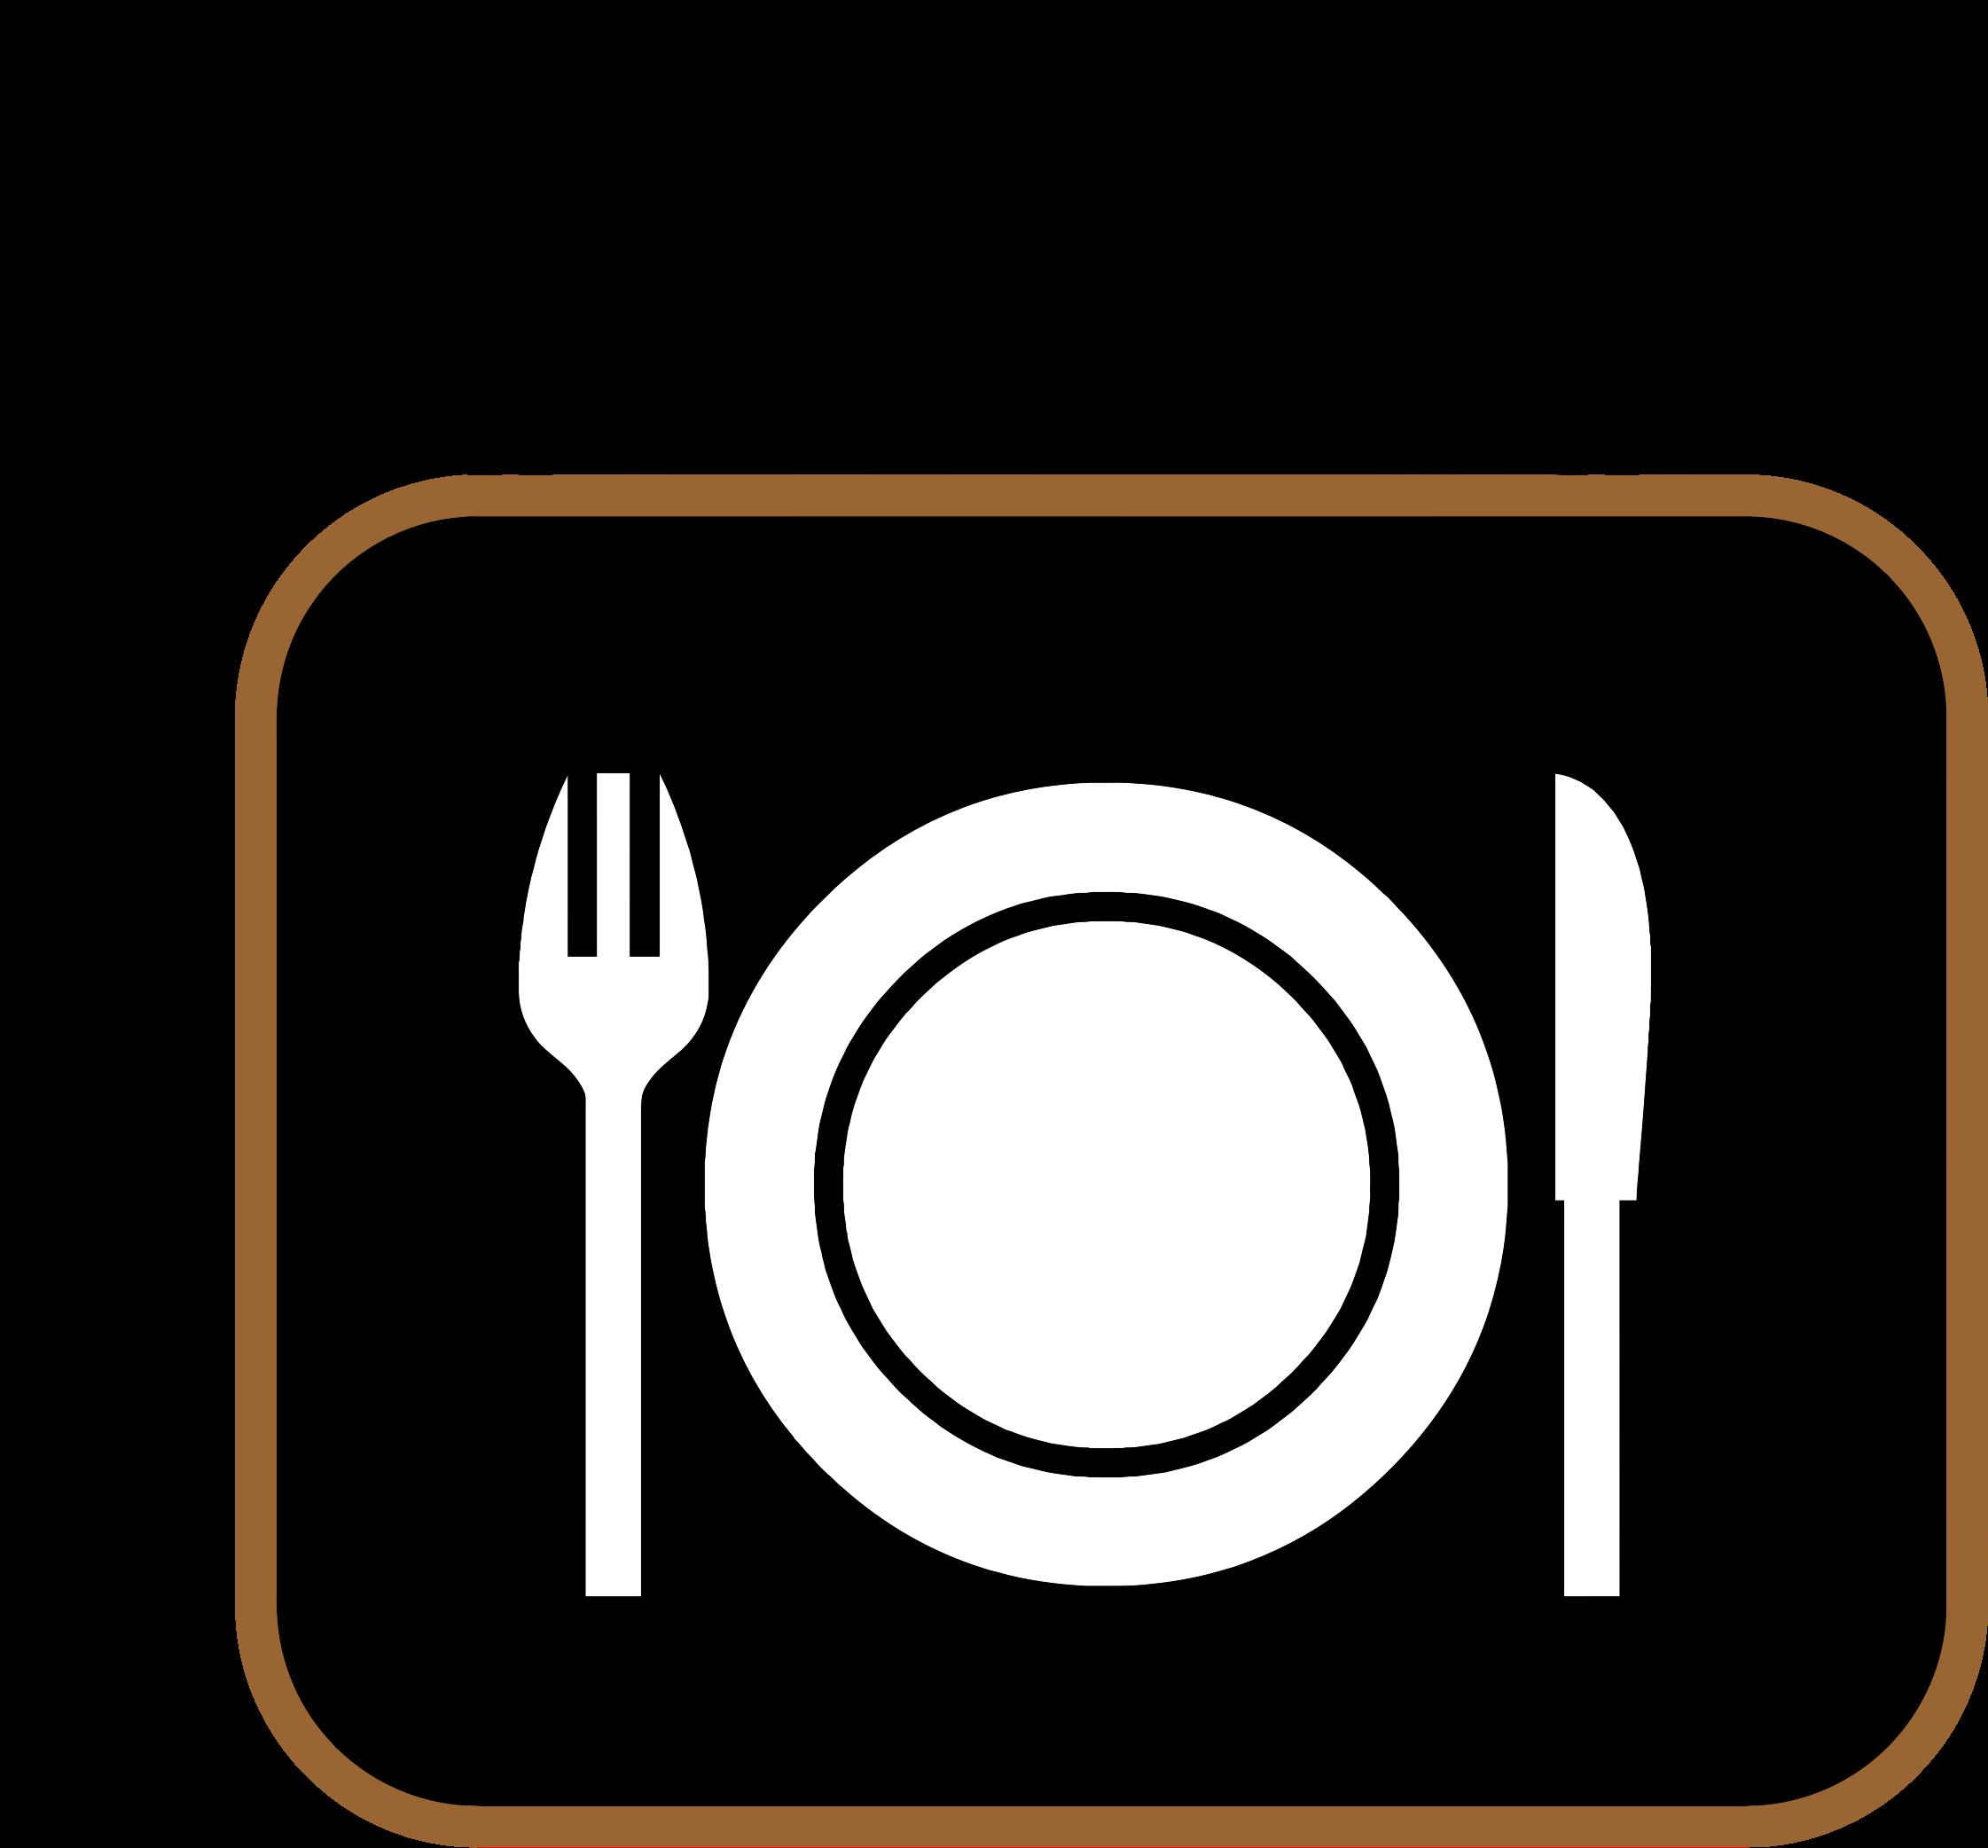 clip library stock Free panda images restaurantclipart. Restaurant clipart